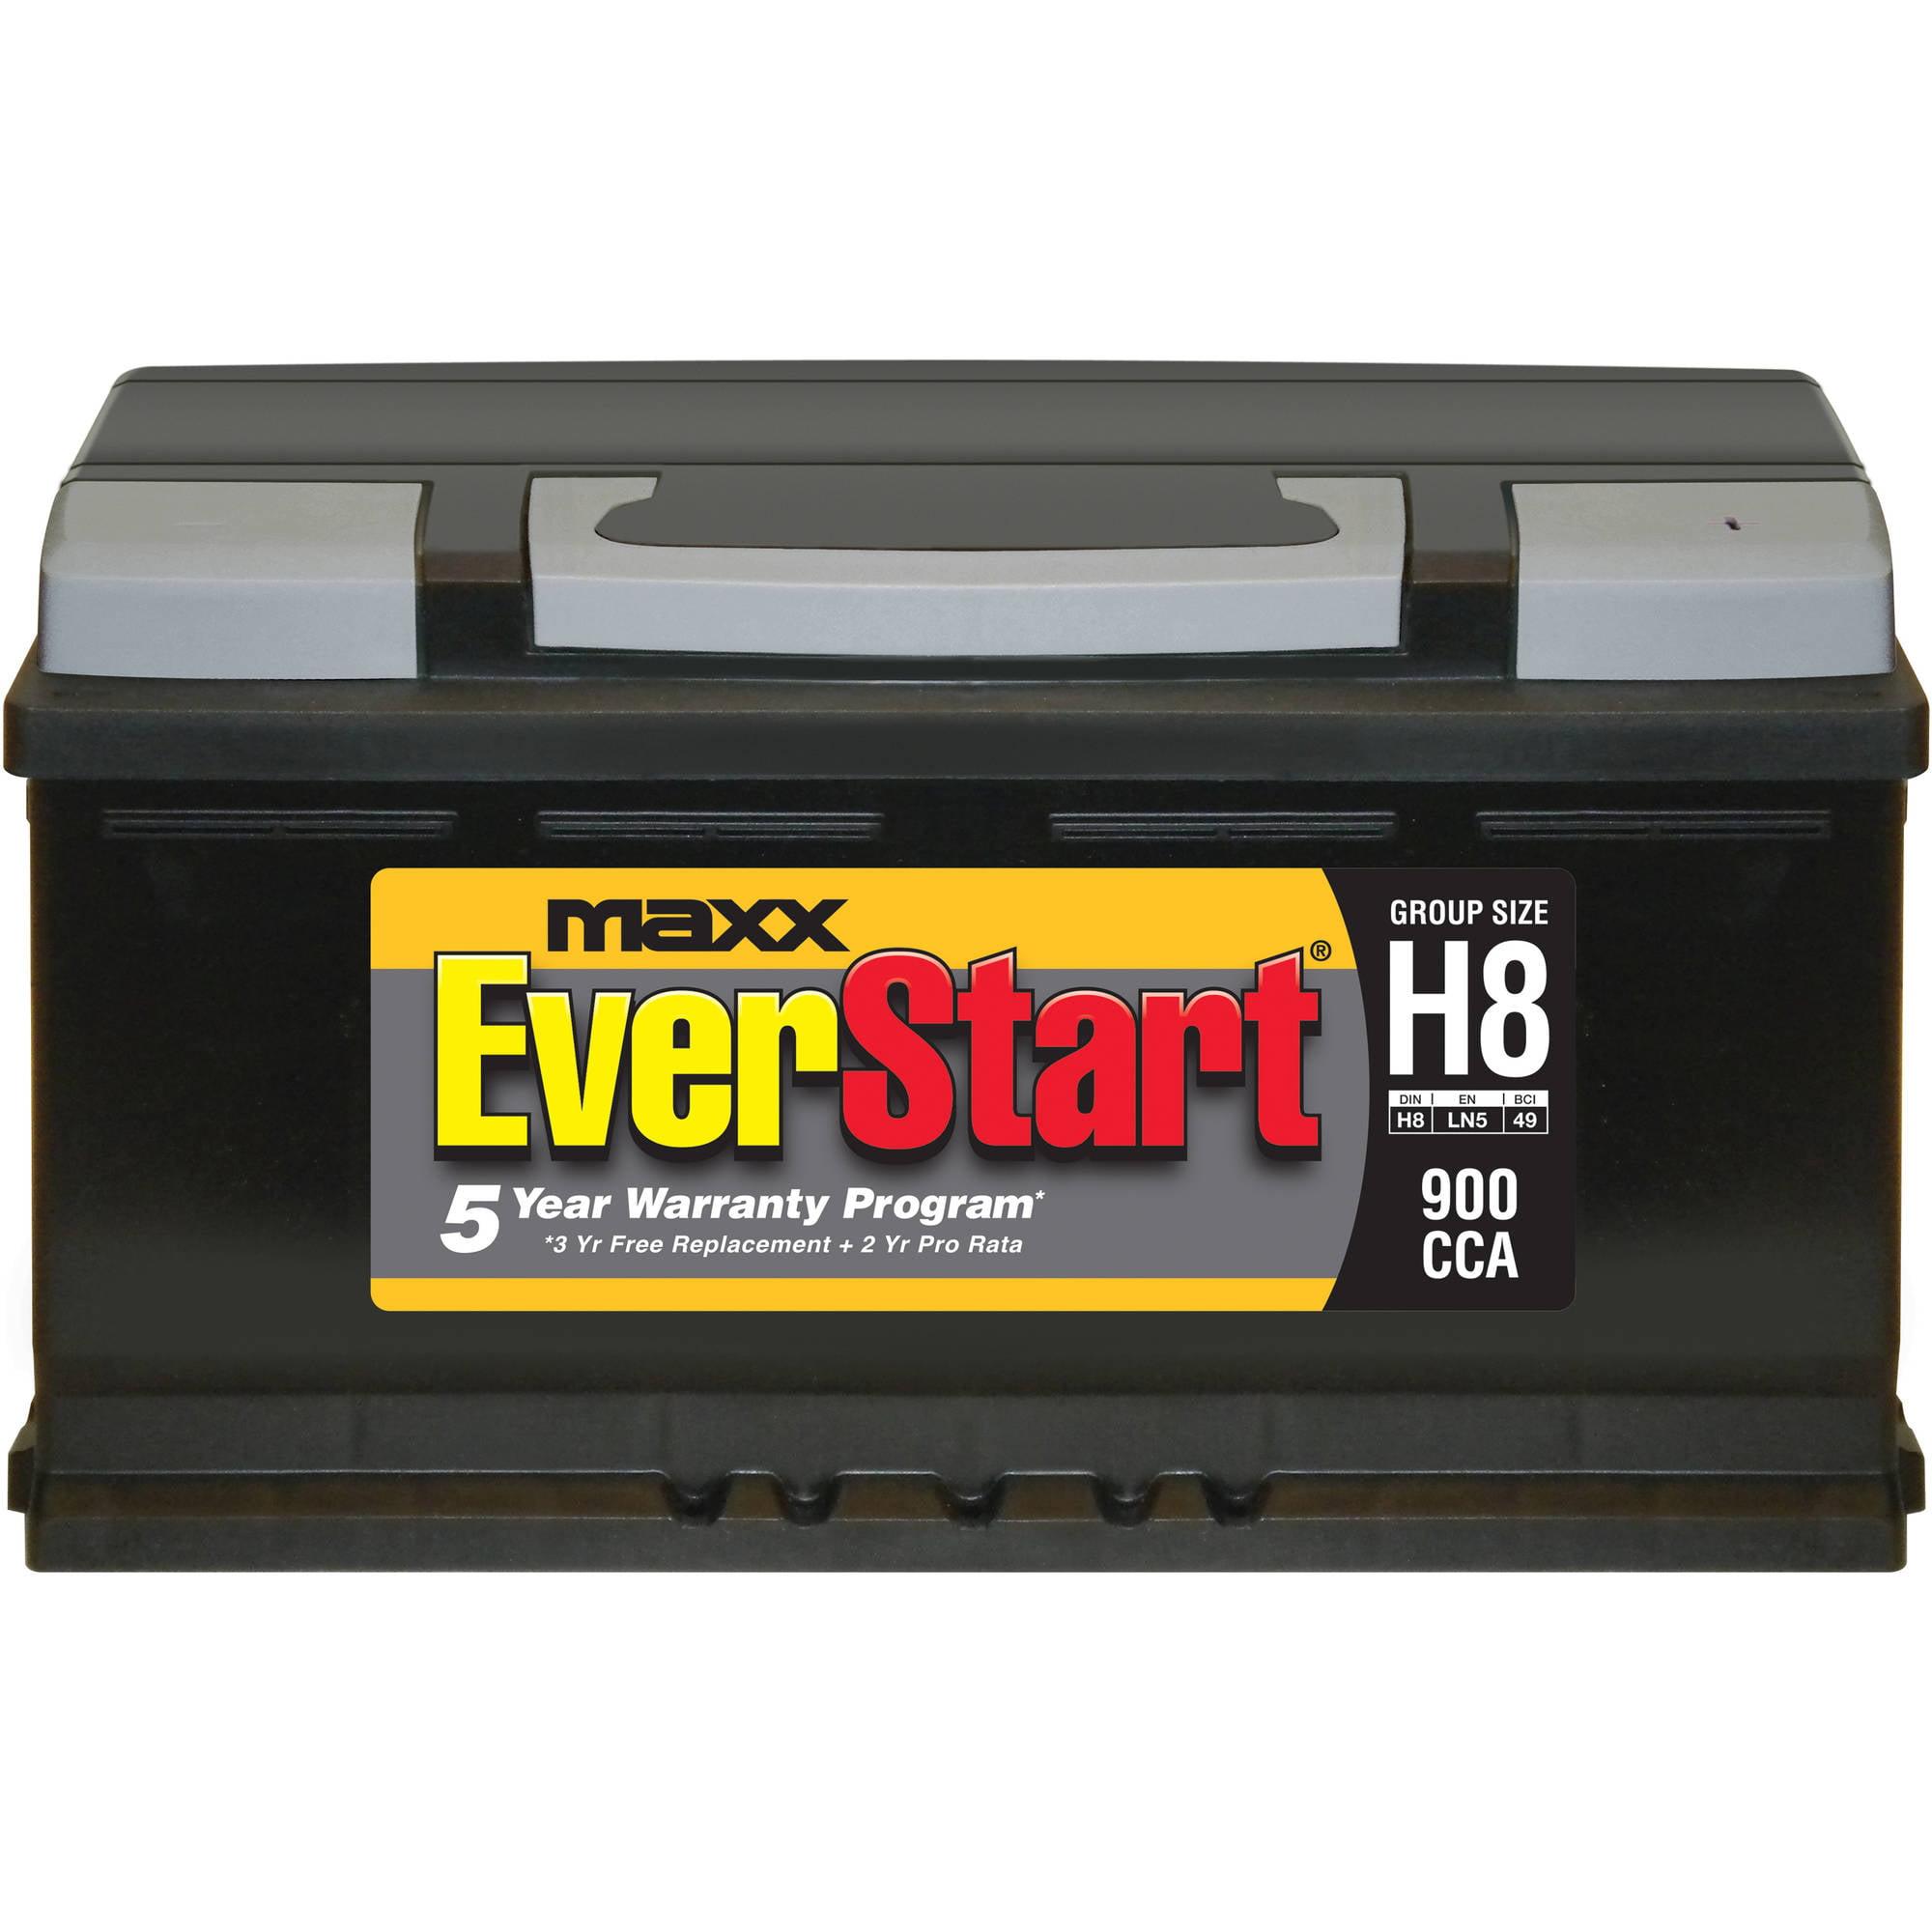 EverStart Maxx Lead Acid Automotive Battery Group Size H8